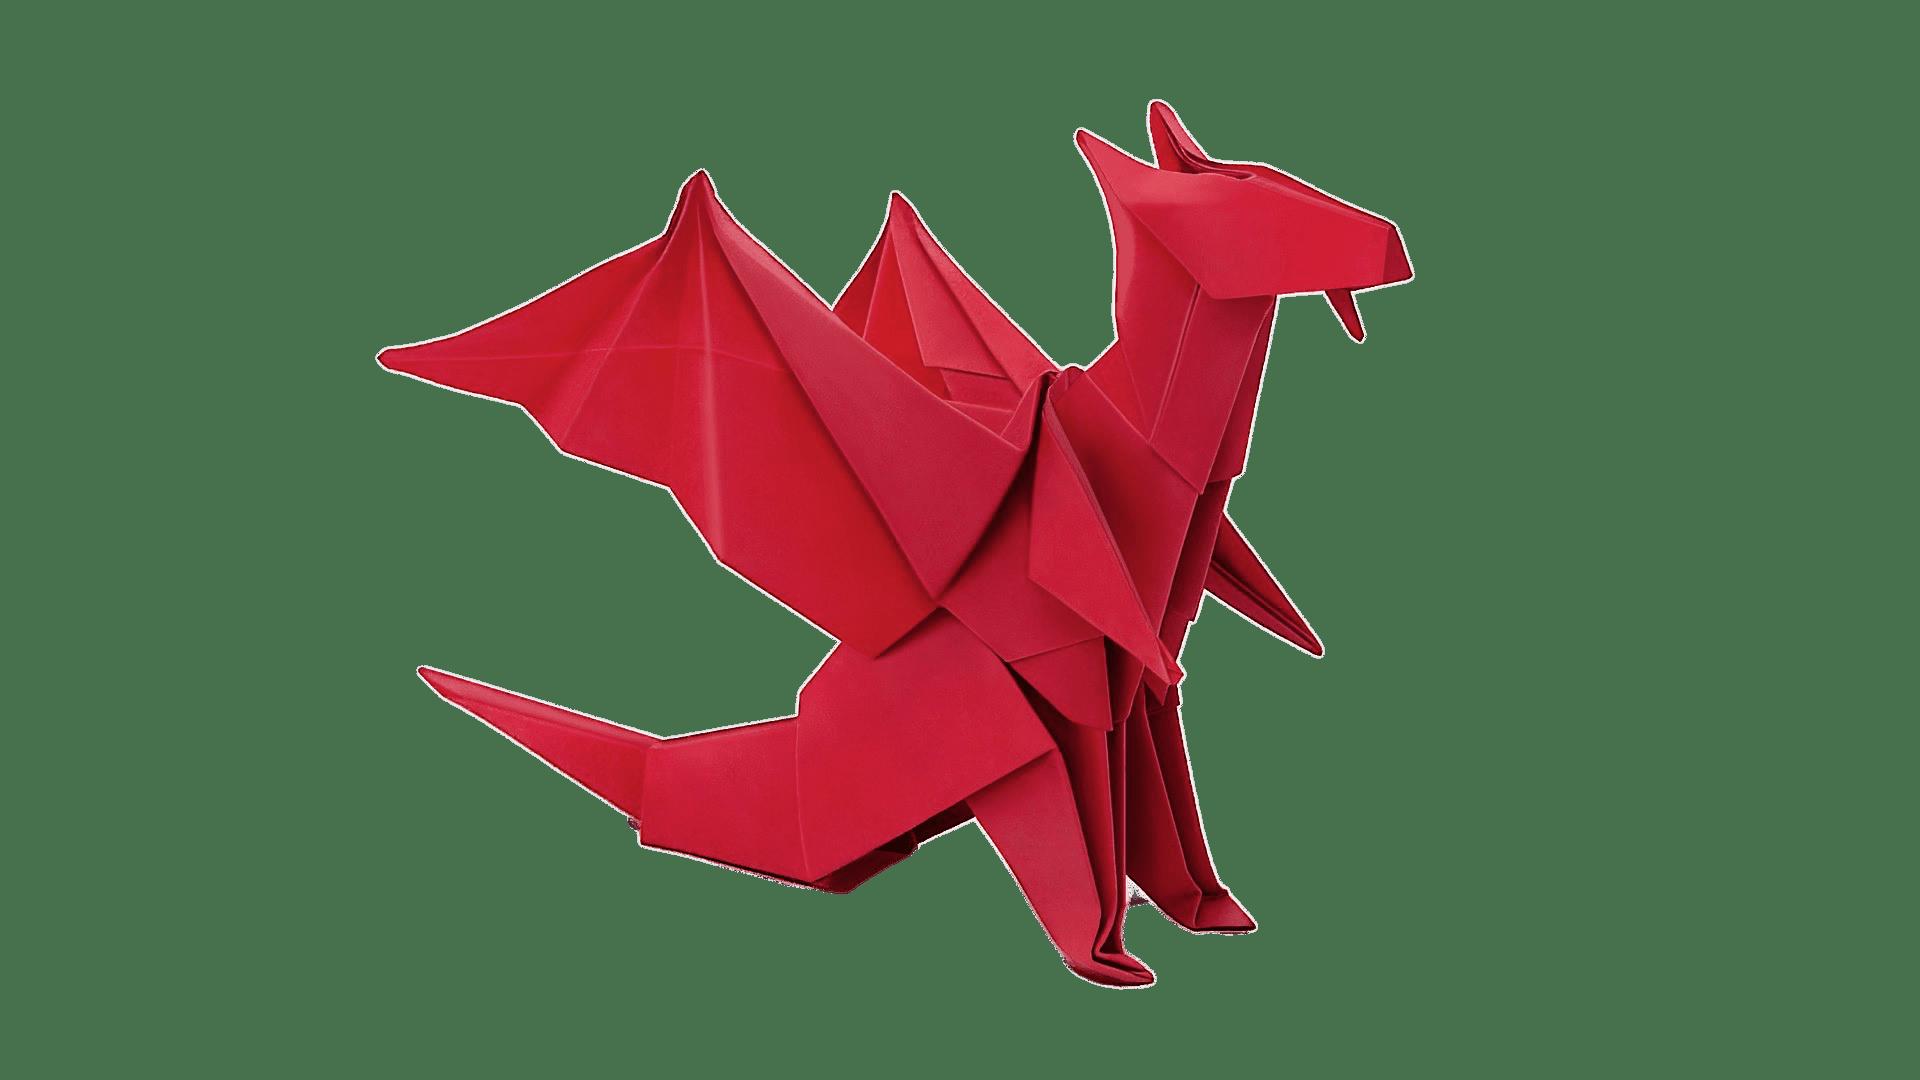 Origami Dragon transparent PNG.